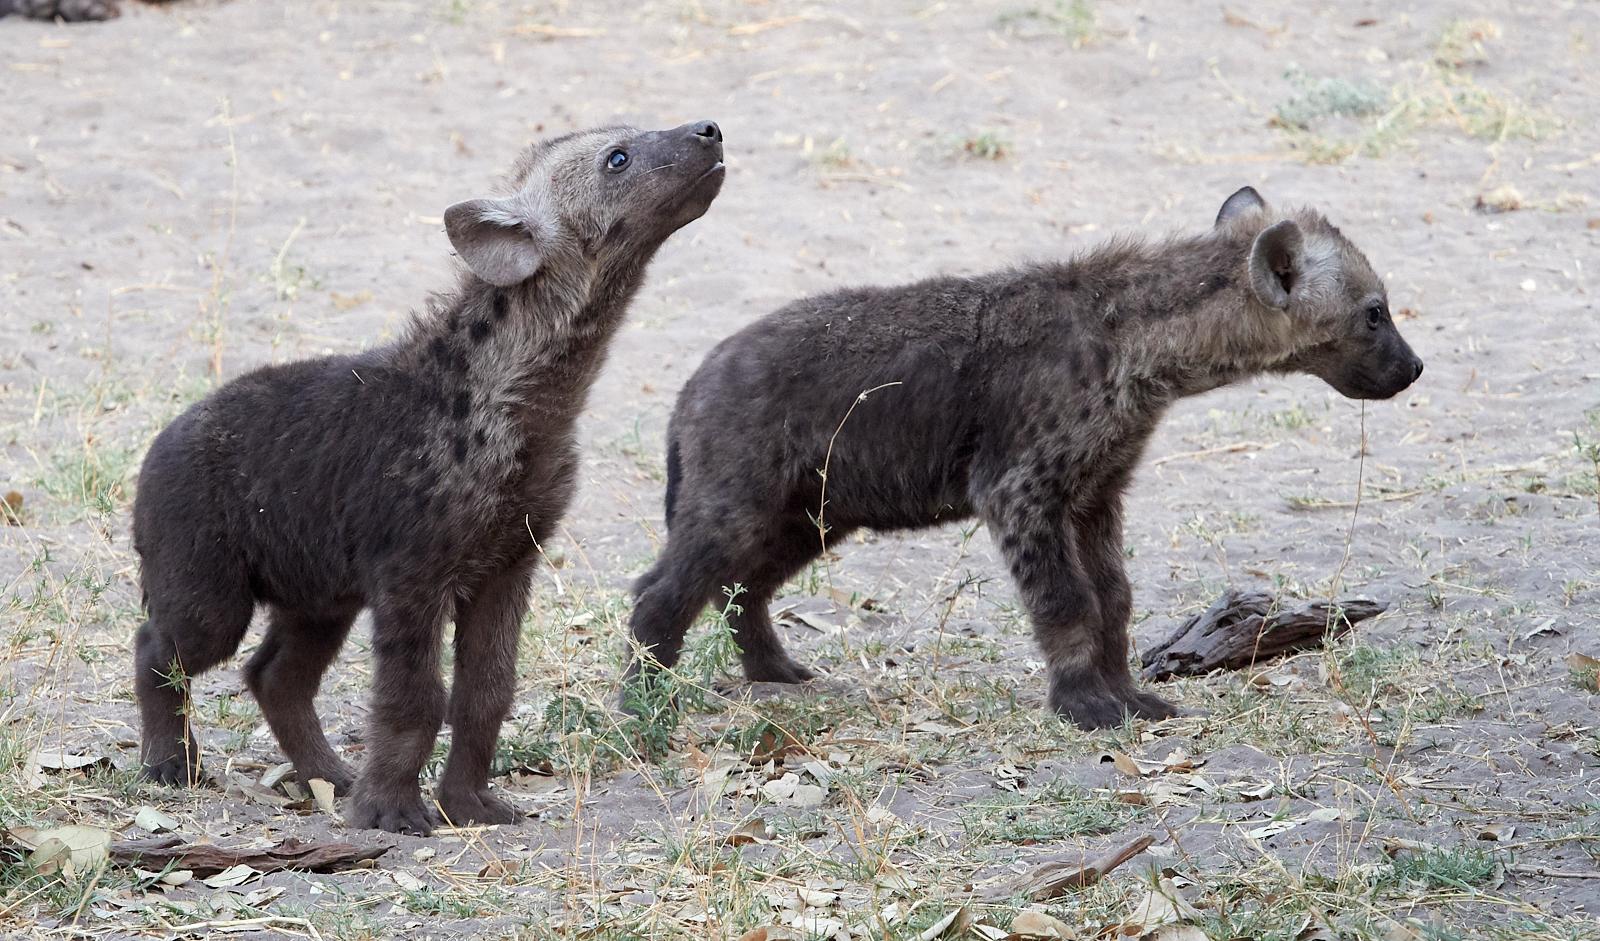 Young hyenas 1600x1200 sRGB.jpg